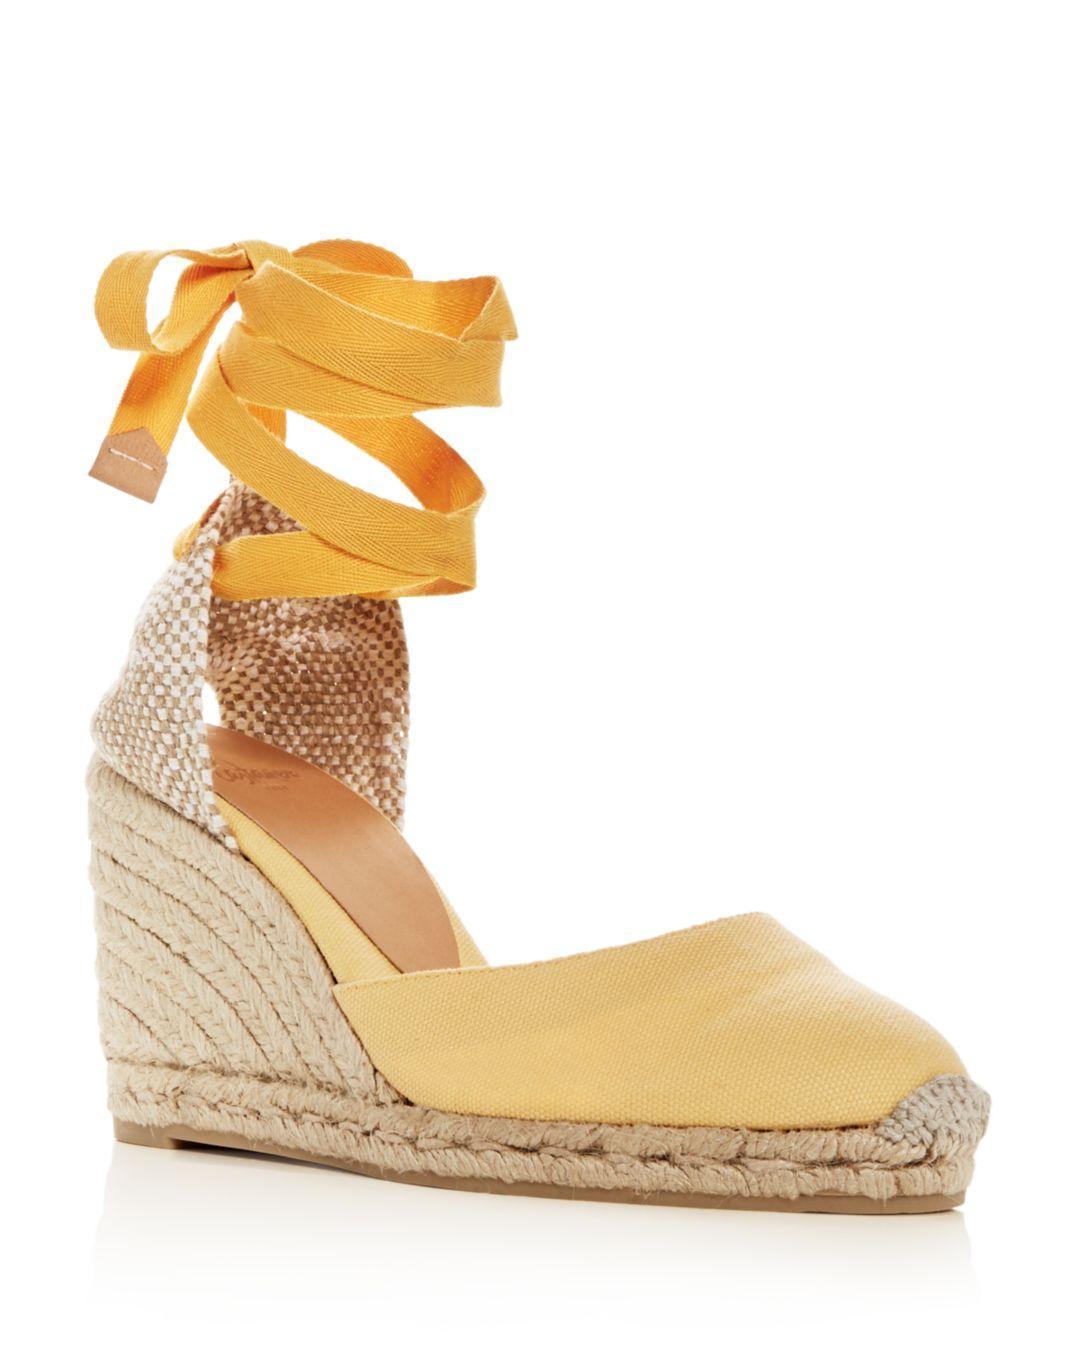 9341304e0b7d Lyst - Castaner Women s Ankle-tie Wedge Platform Espadrille Sandals